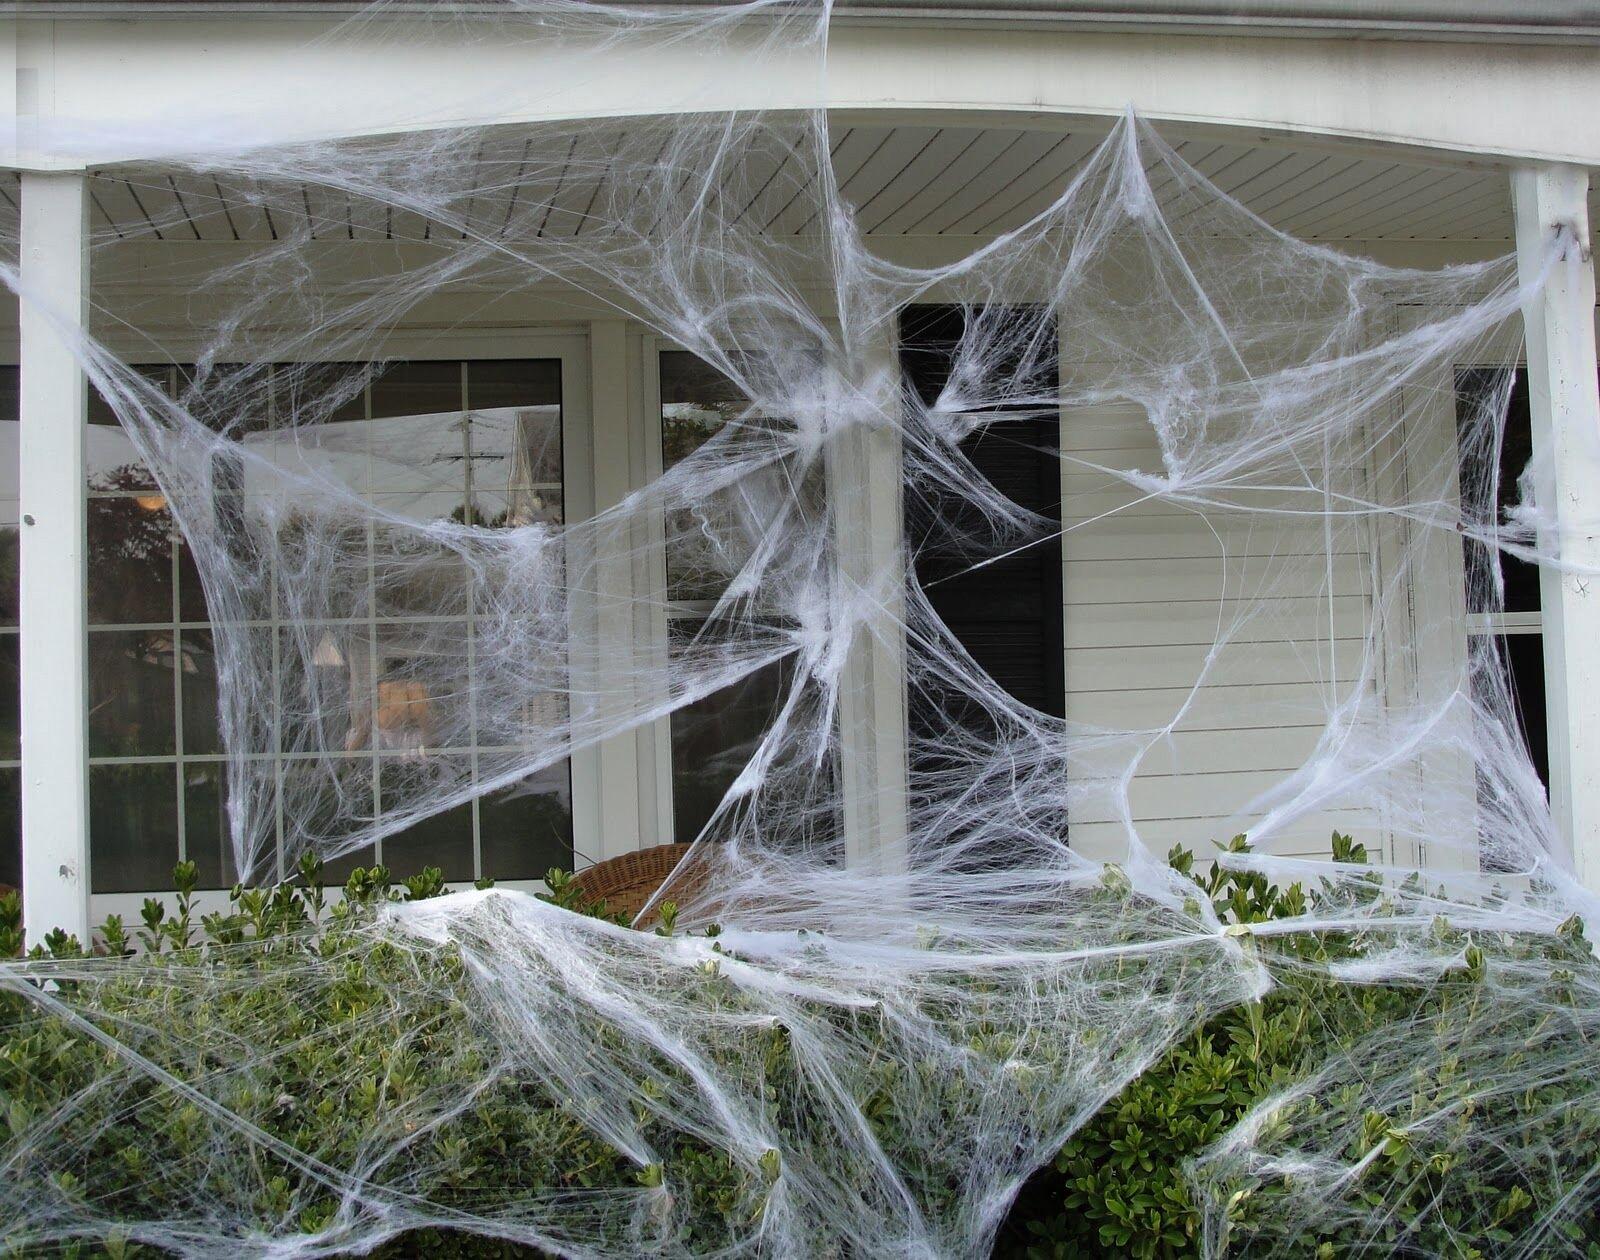 1000 sqft fake spider web halloween party outdoor. Black Bedroom Furniture Sets. Home Design Ideas